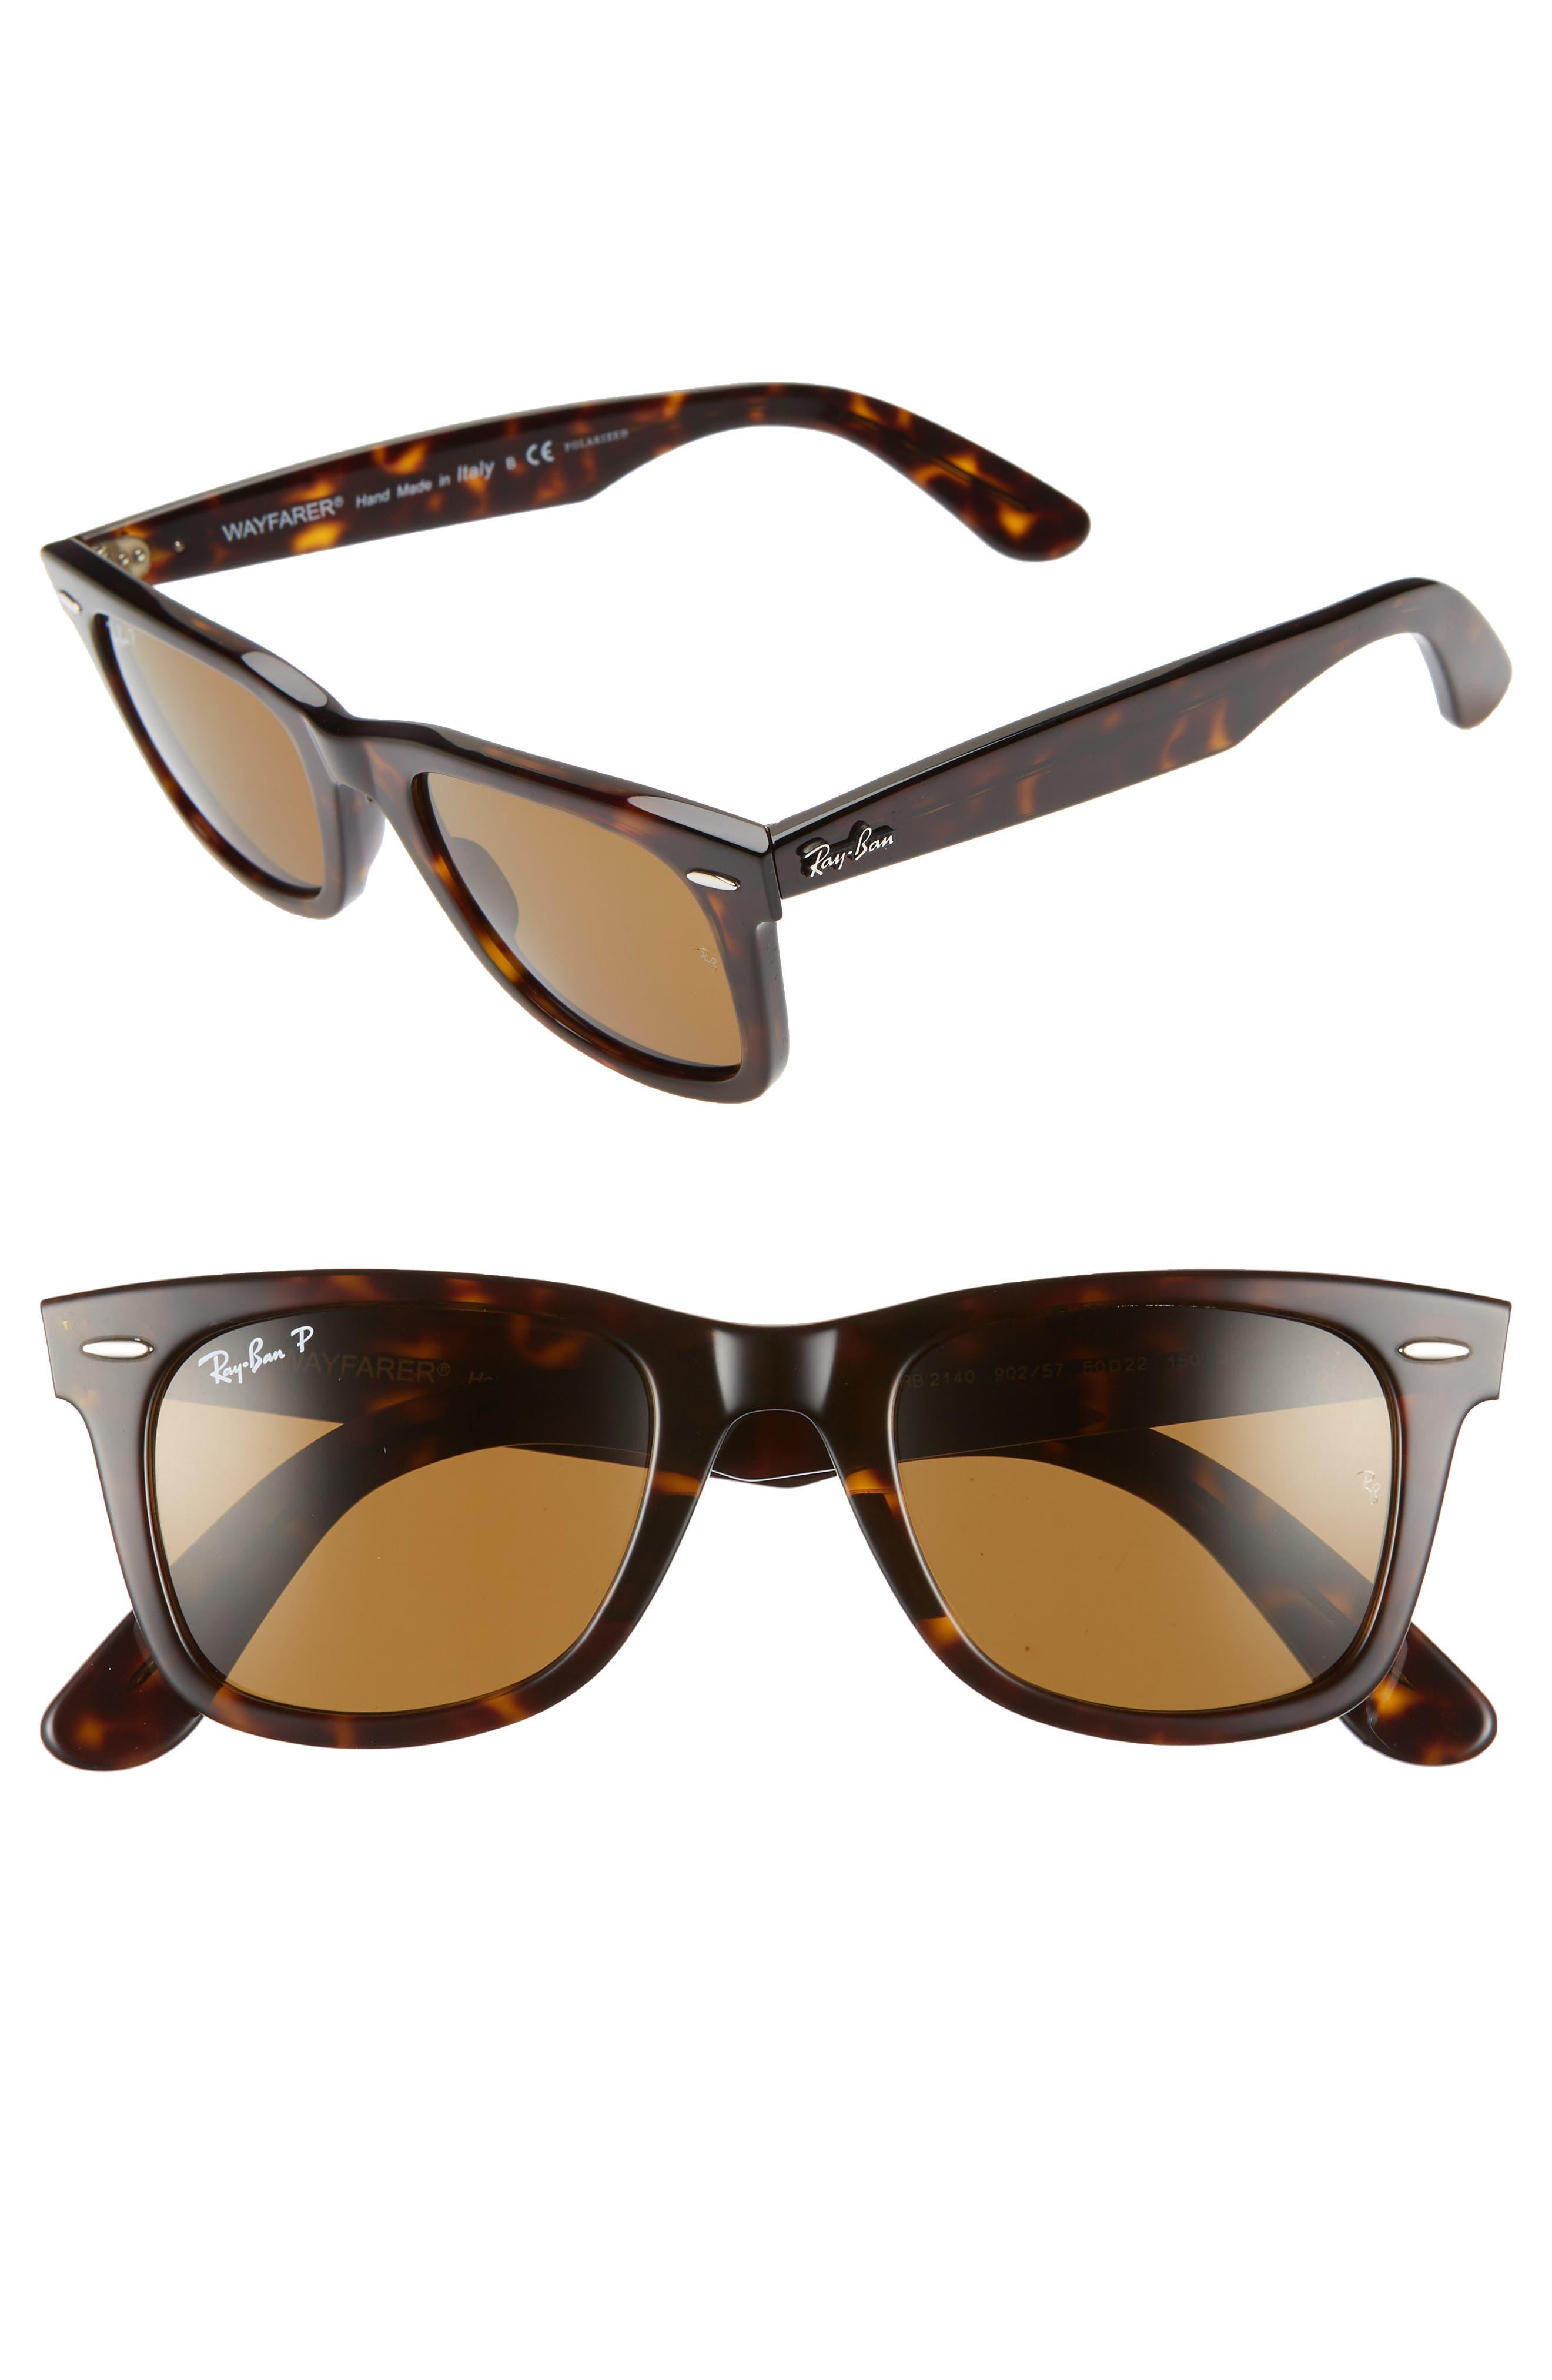 Standard Classic Wayfarer 50mm Polarized Sunglasses,                             Main thumbnail 1, color,                             205